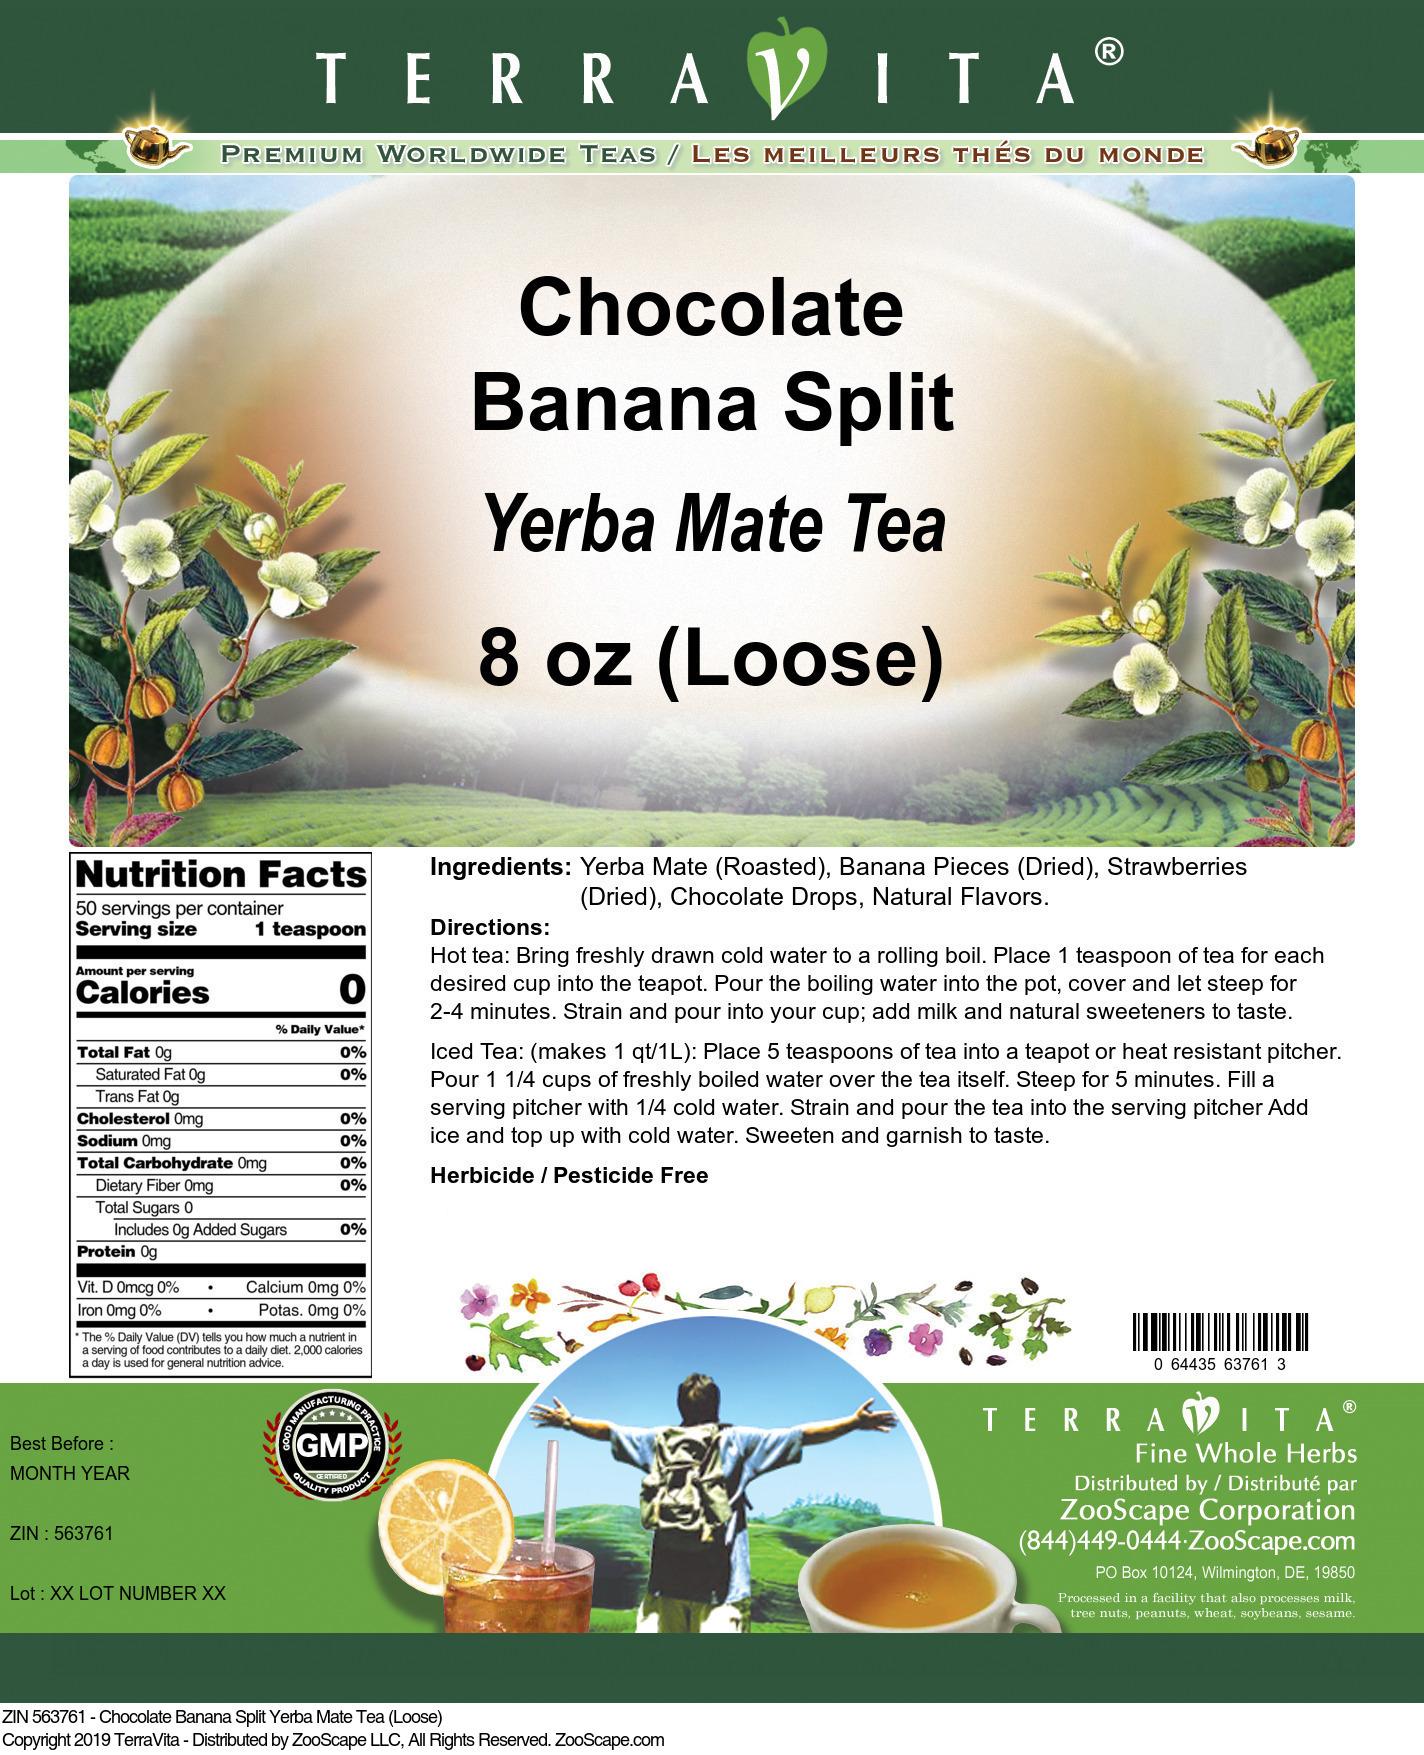 Chocolate Banana Split Yerba Mate Tea (Loose)